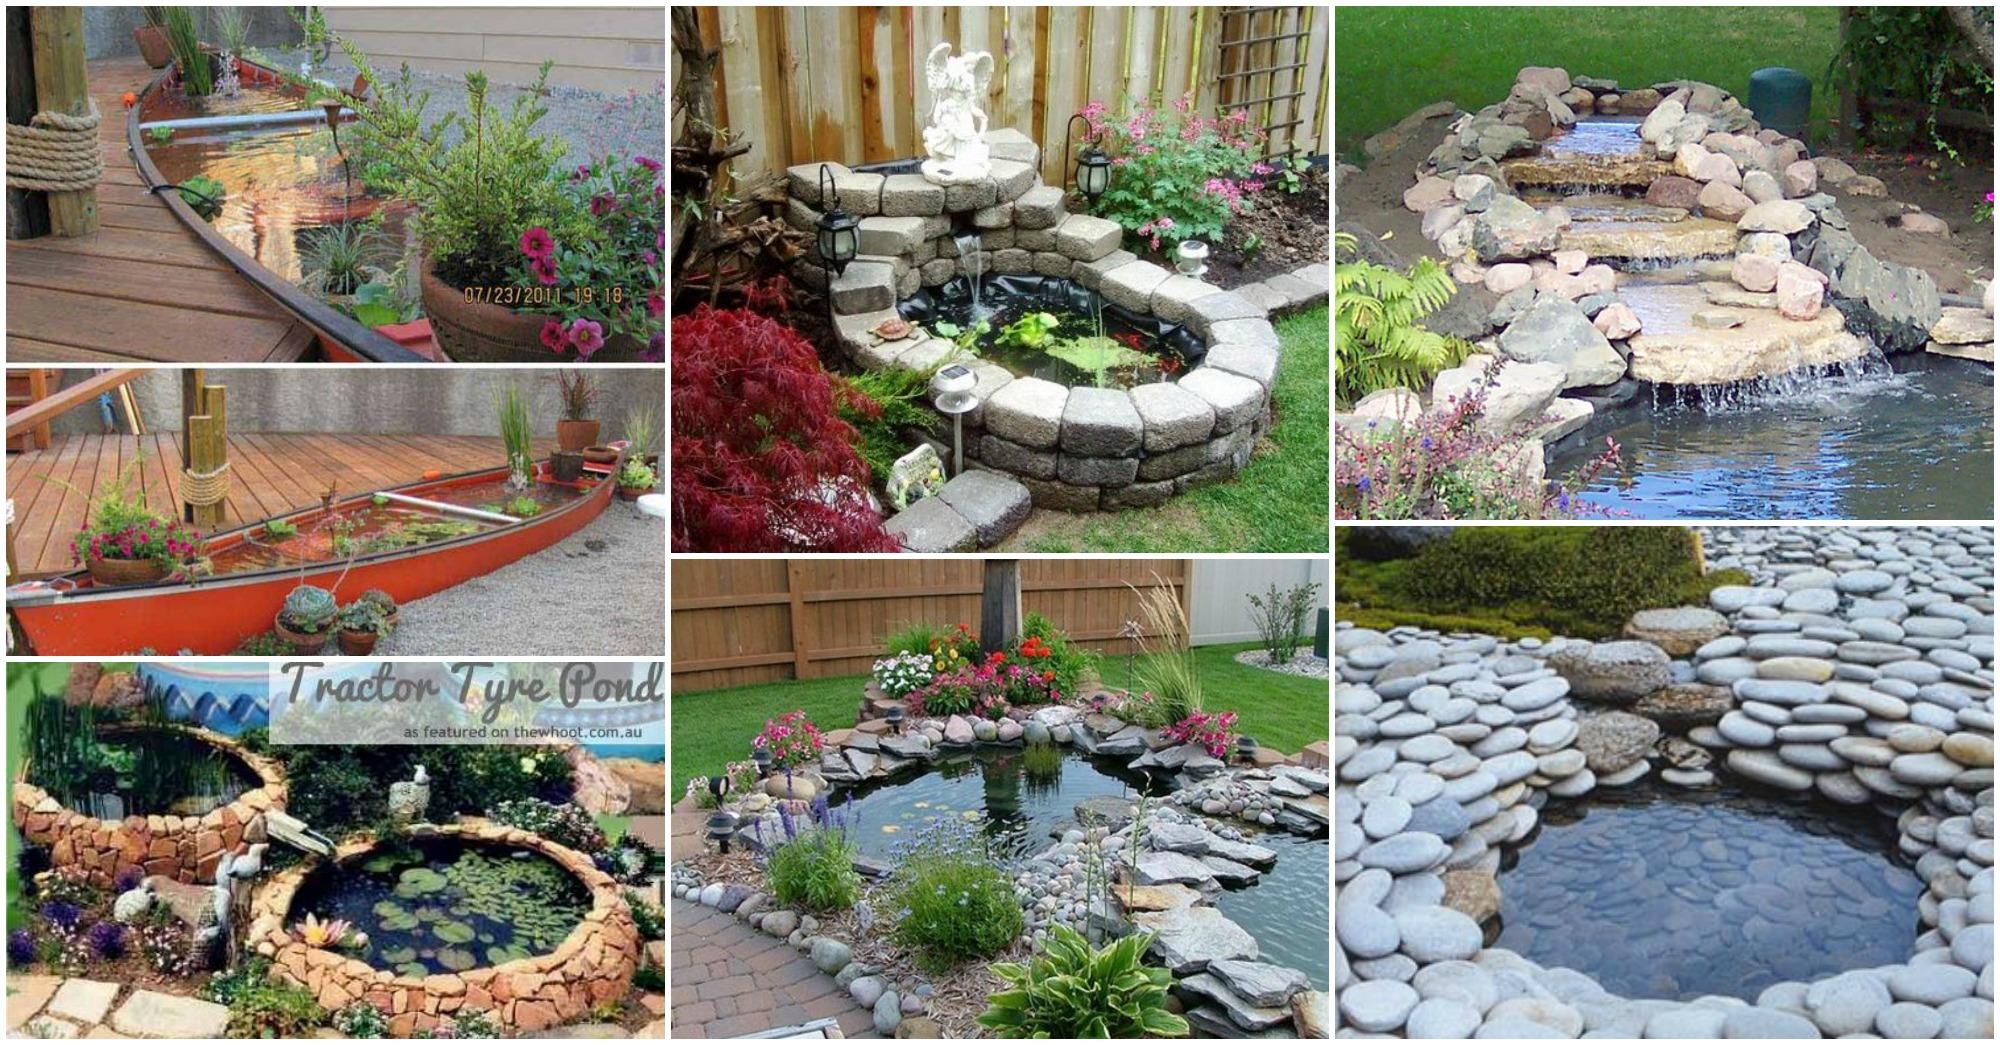 prolandscape.info & 25+ Diy Pond Landscaping Pictures and Ideas on Pro Landscape